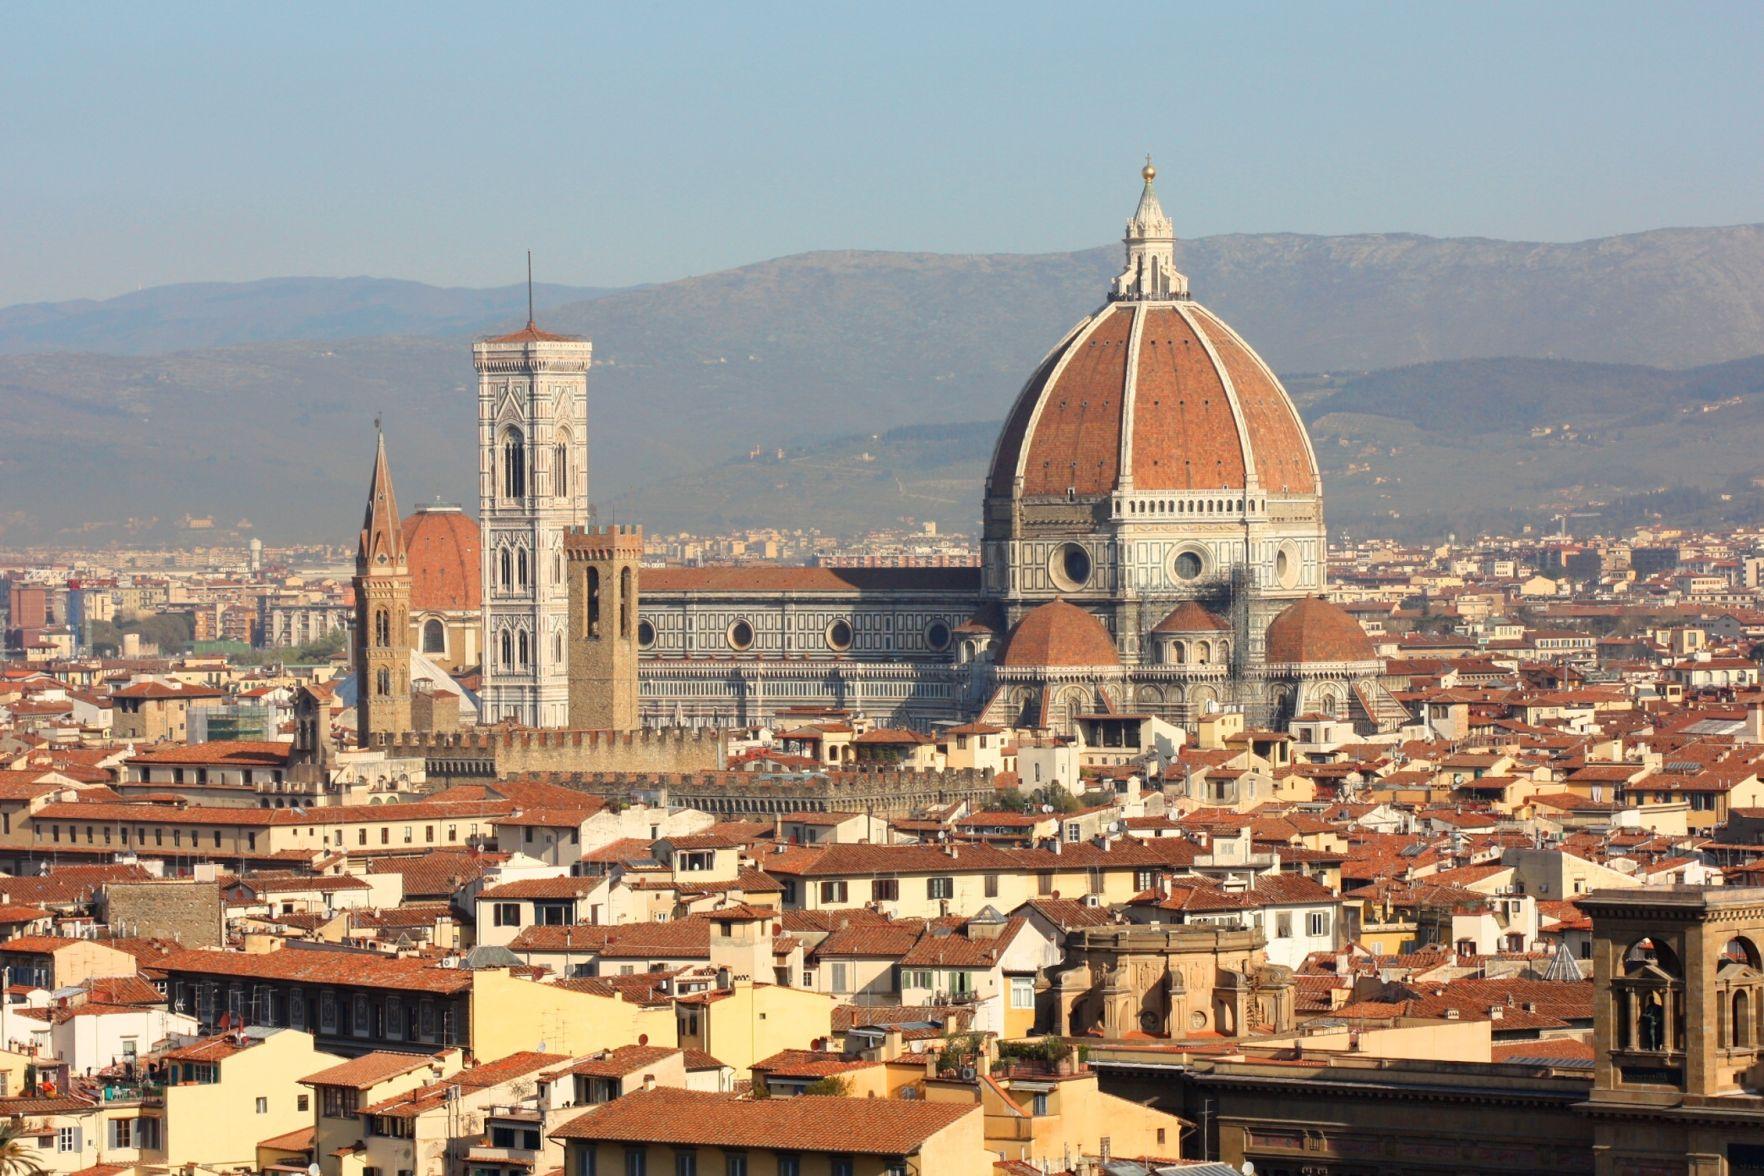 Florence Italy Skyline with Duomo